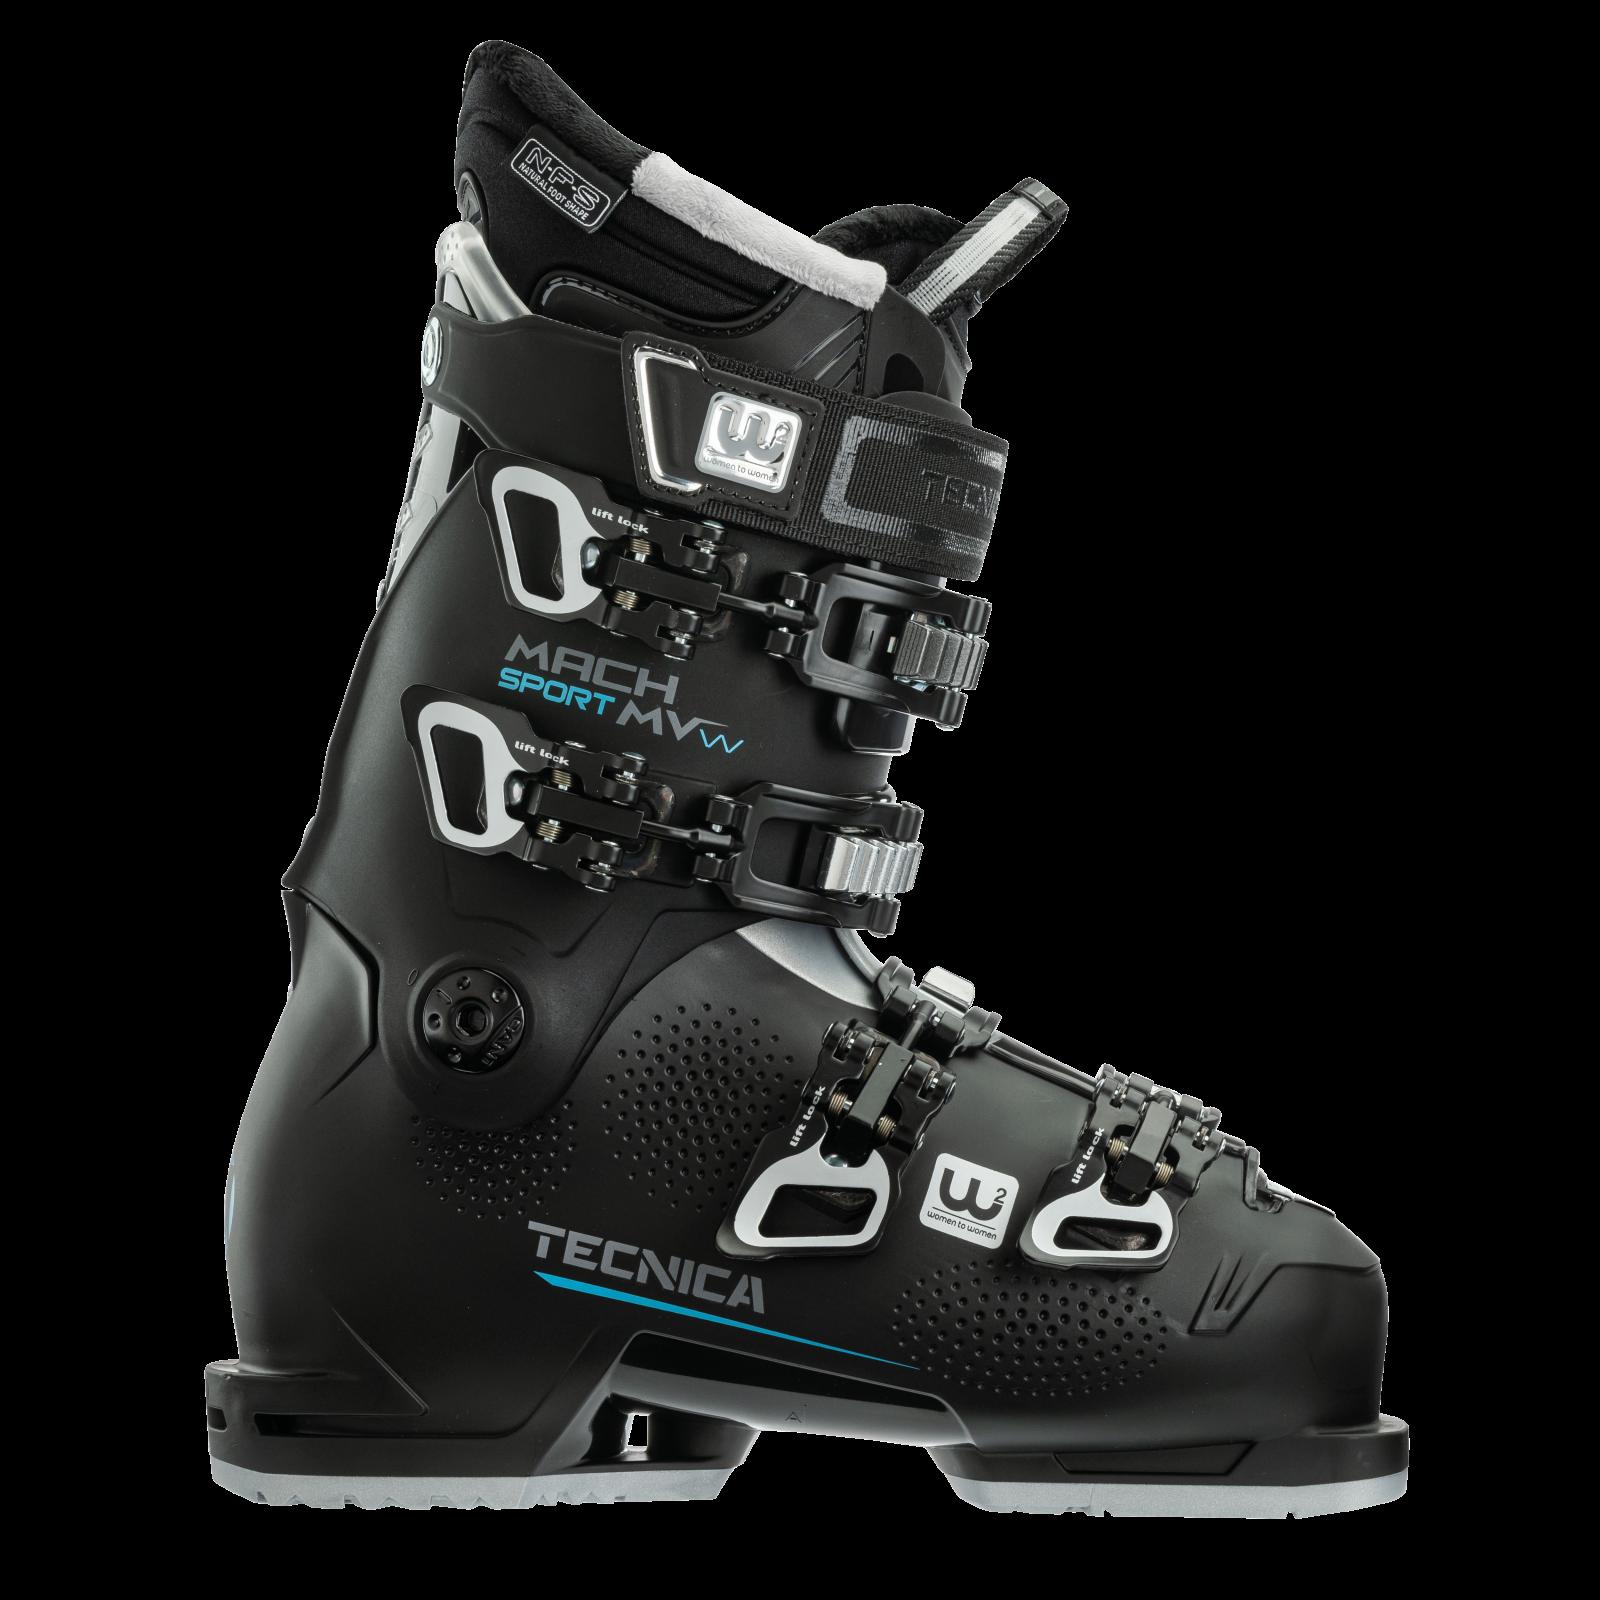 2021 Tecnica Mach Sport MV 85 Women's Ski Boots